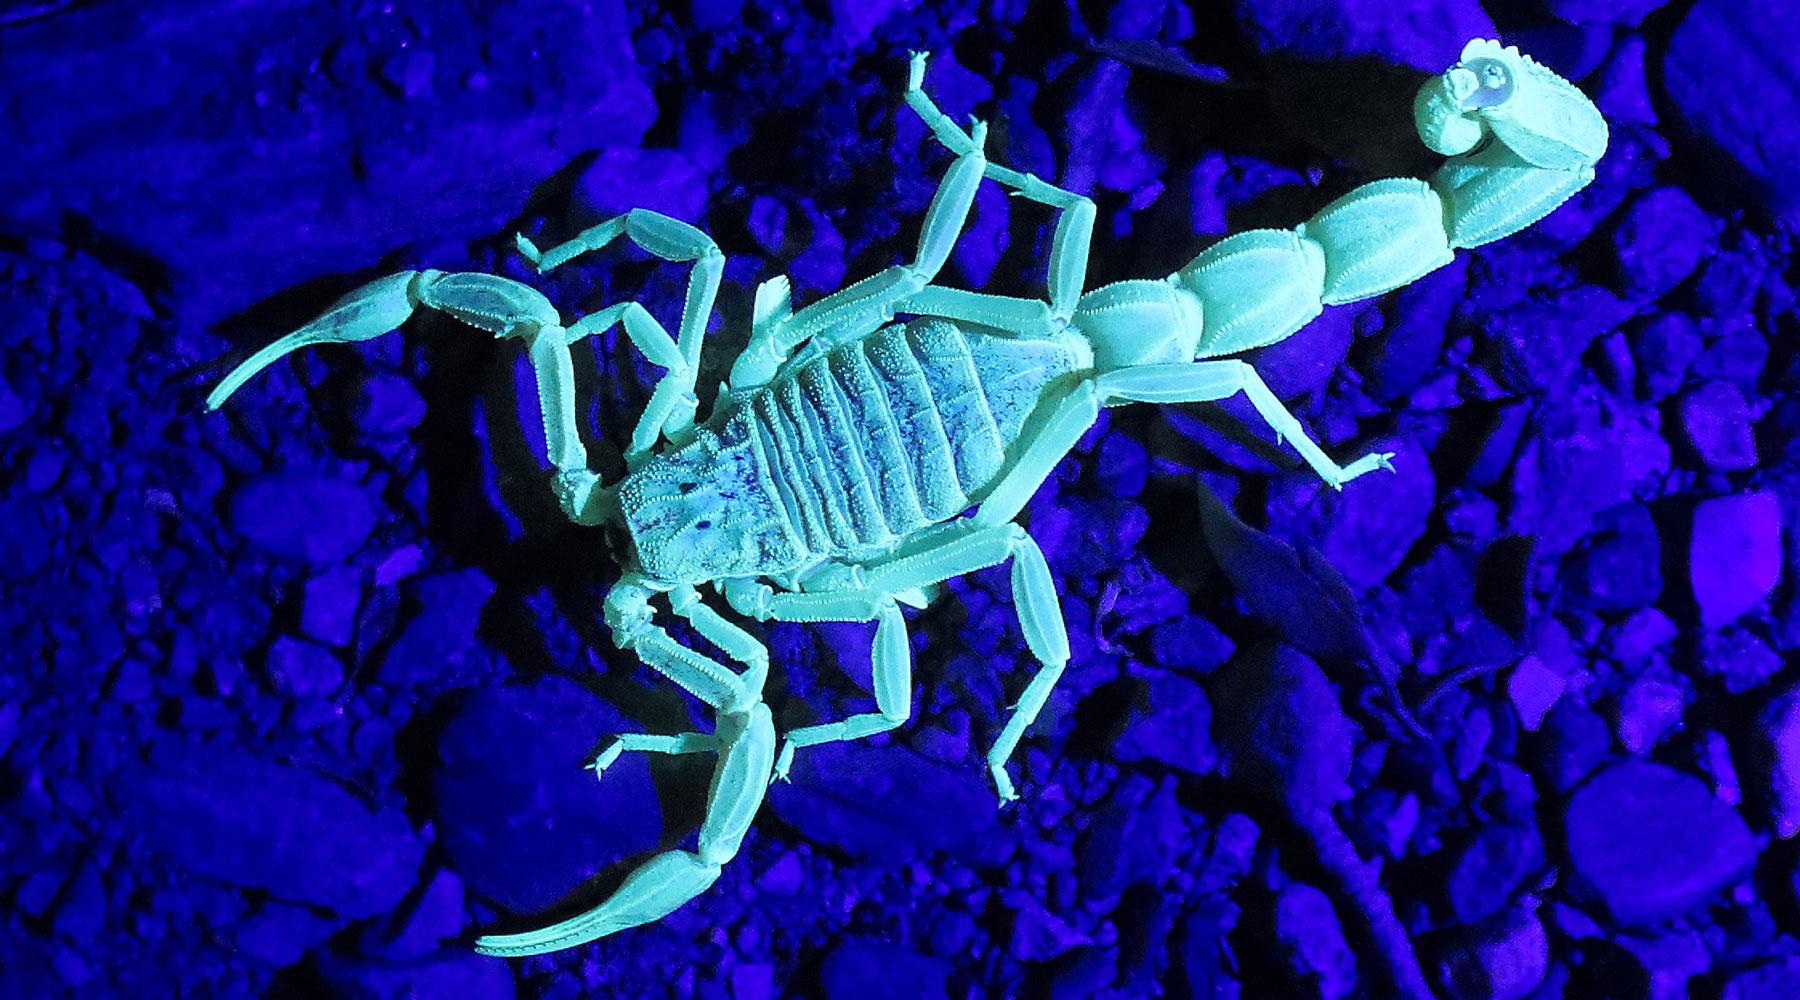 Glowing Scorpion